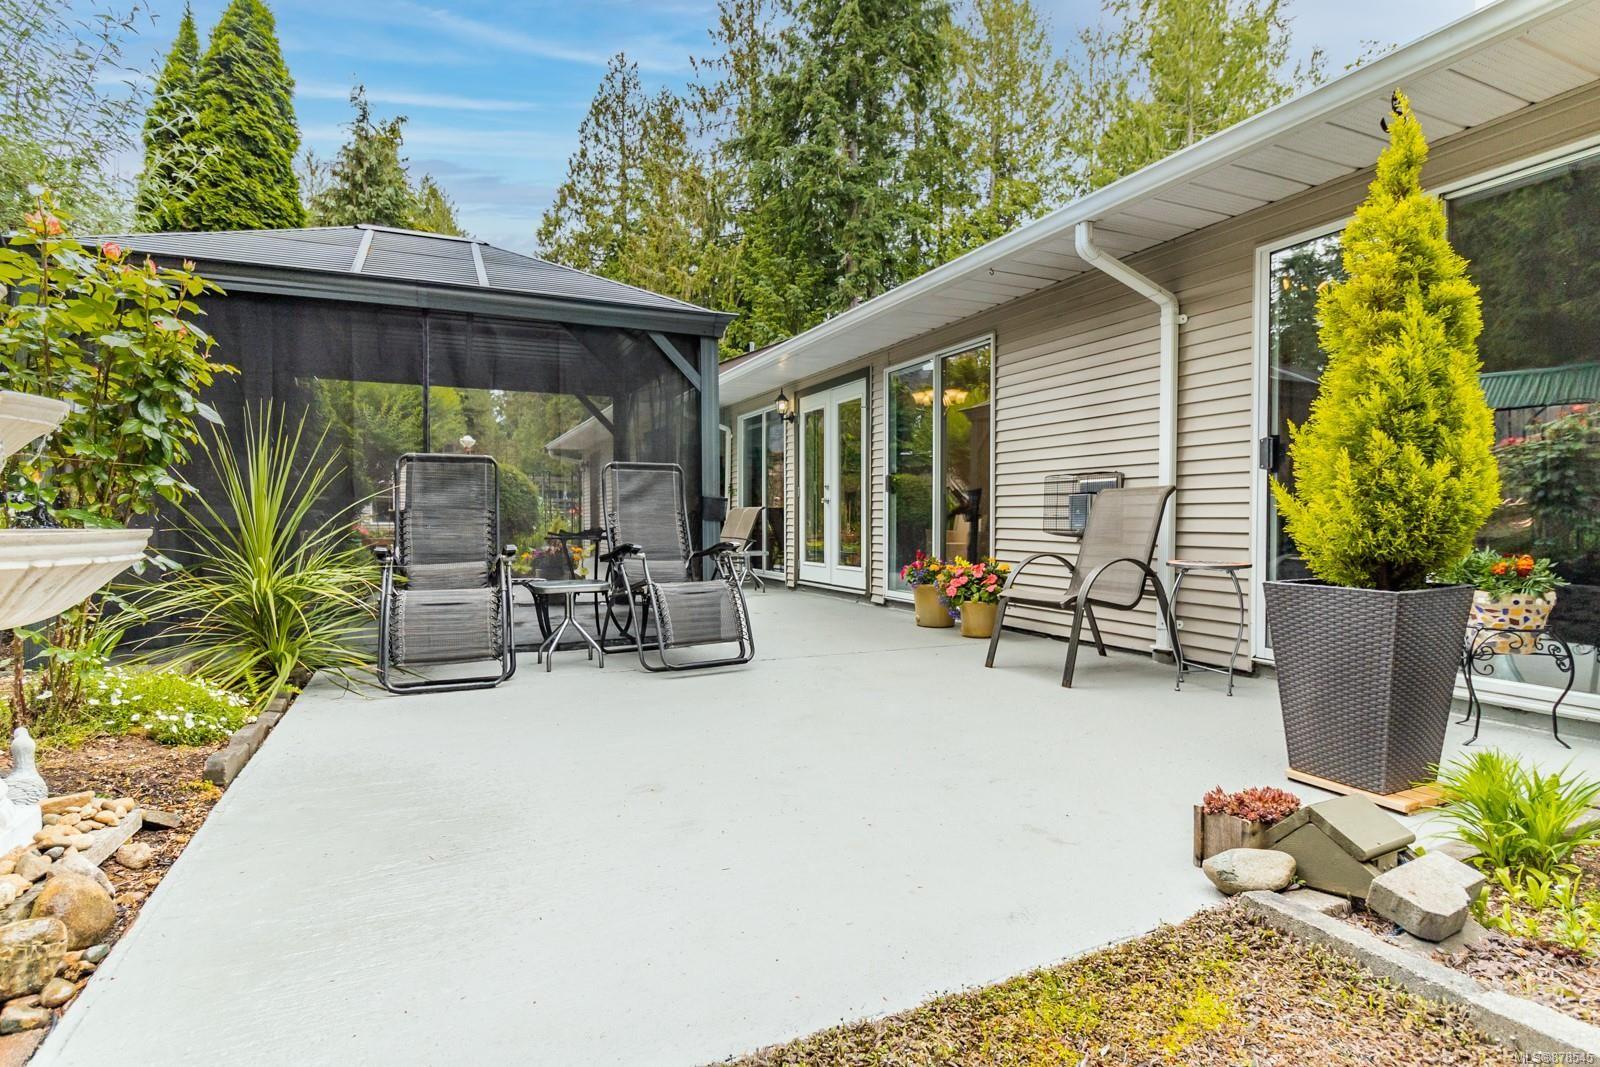 Photo 29: Photos: 1070 Symons Cres in : PQ Qualicum Beach House for sale (Parksville/Qualicum)  : MLS®# 878545